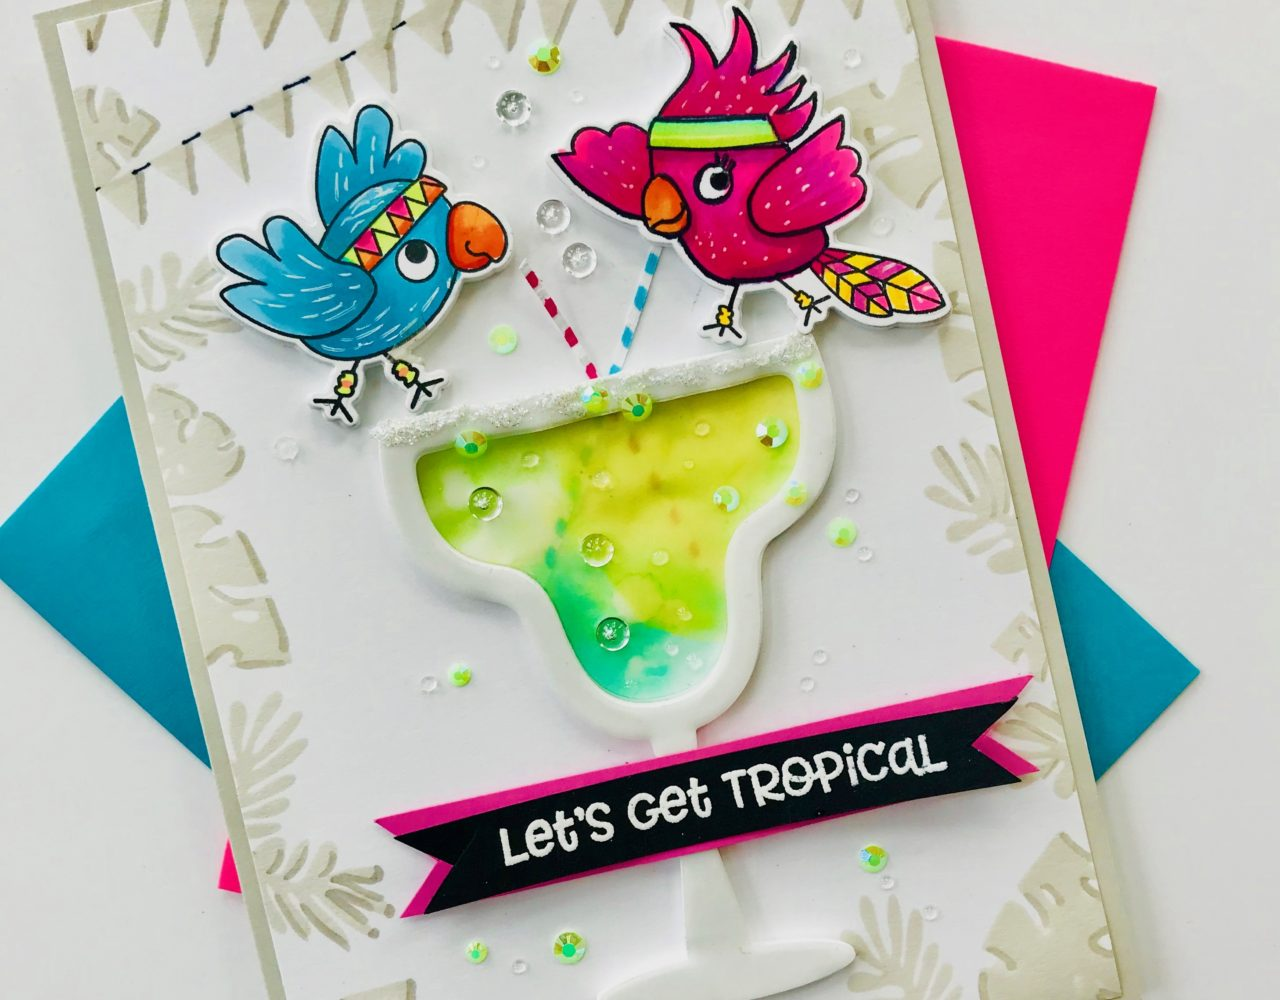 Let's Get Tropical!